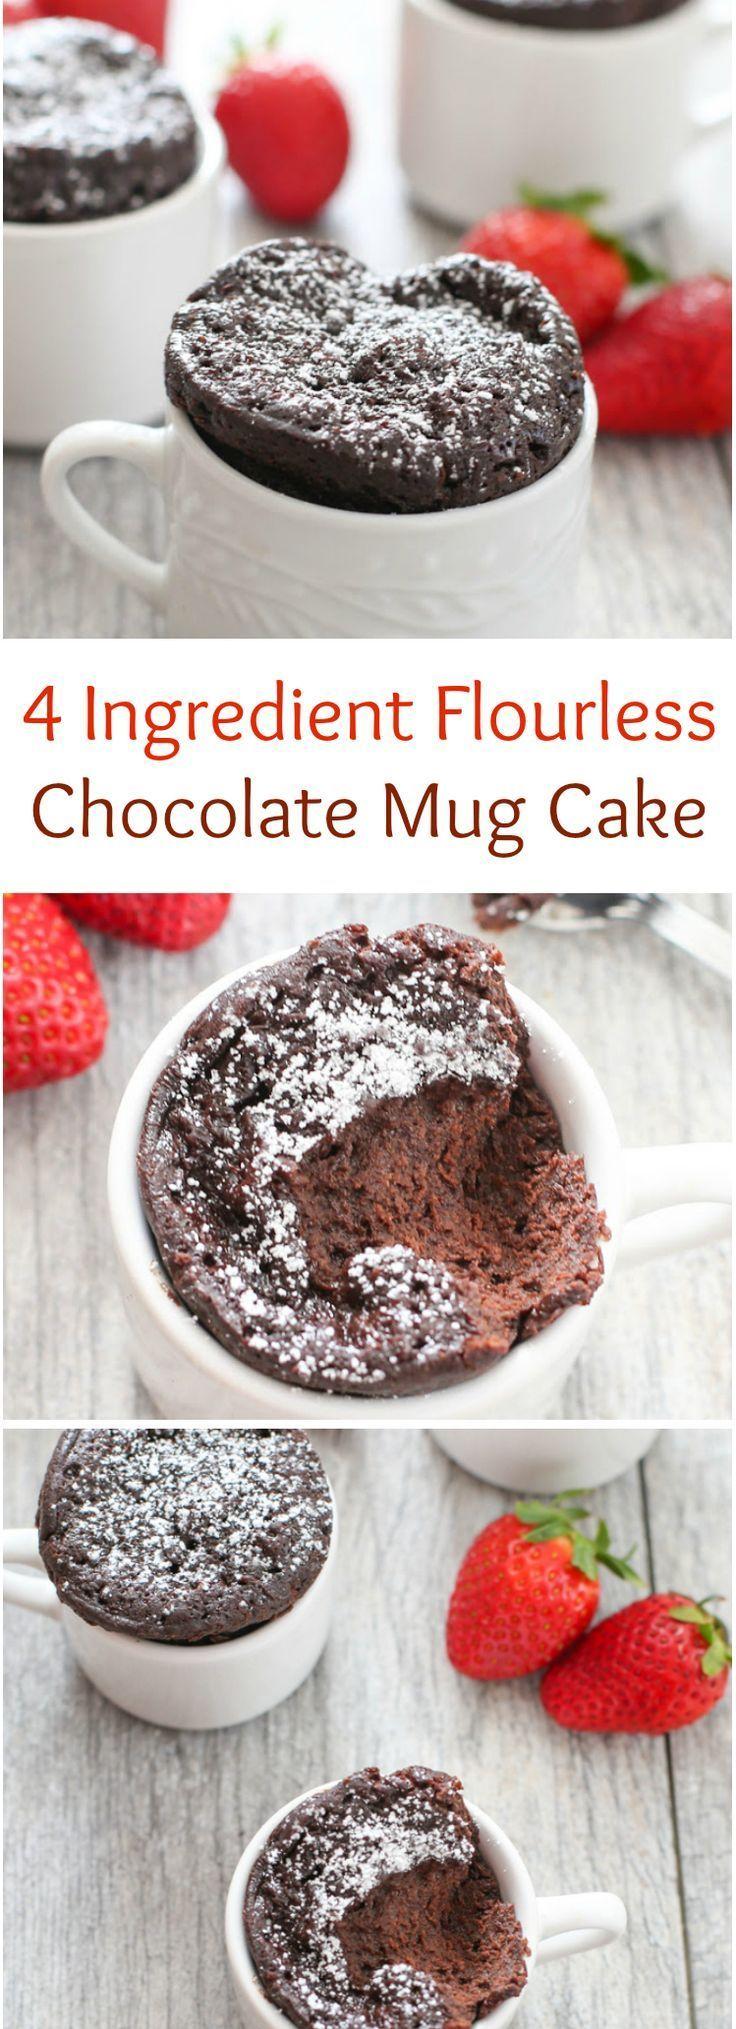 4 Ingredient Flourless Chocolate Mug Cake | Recipe ...